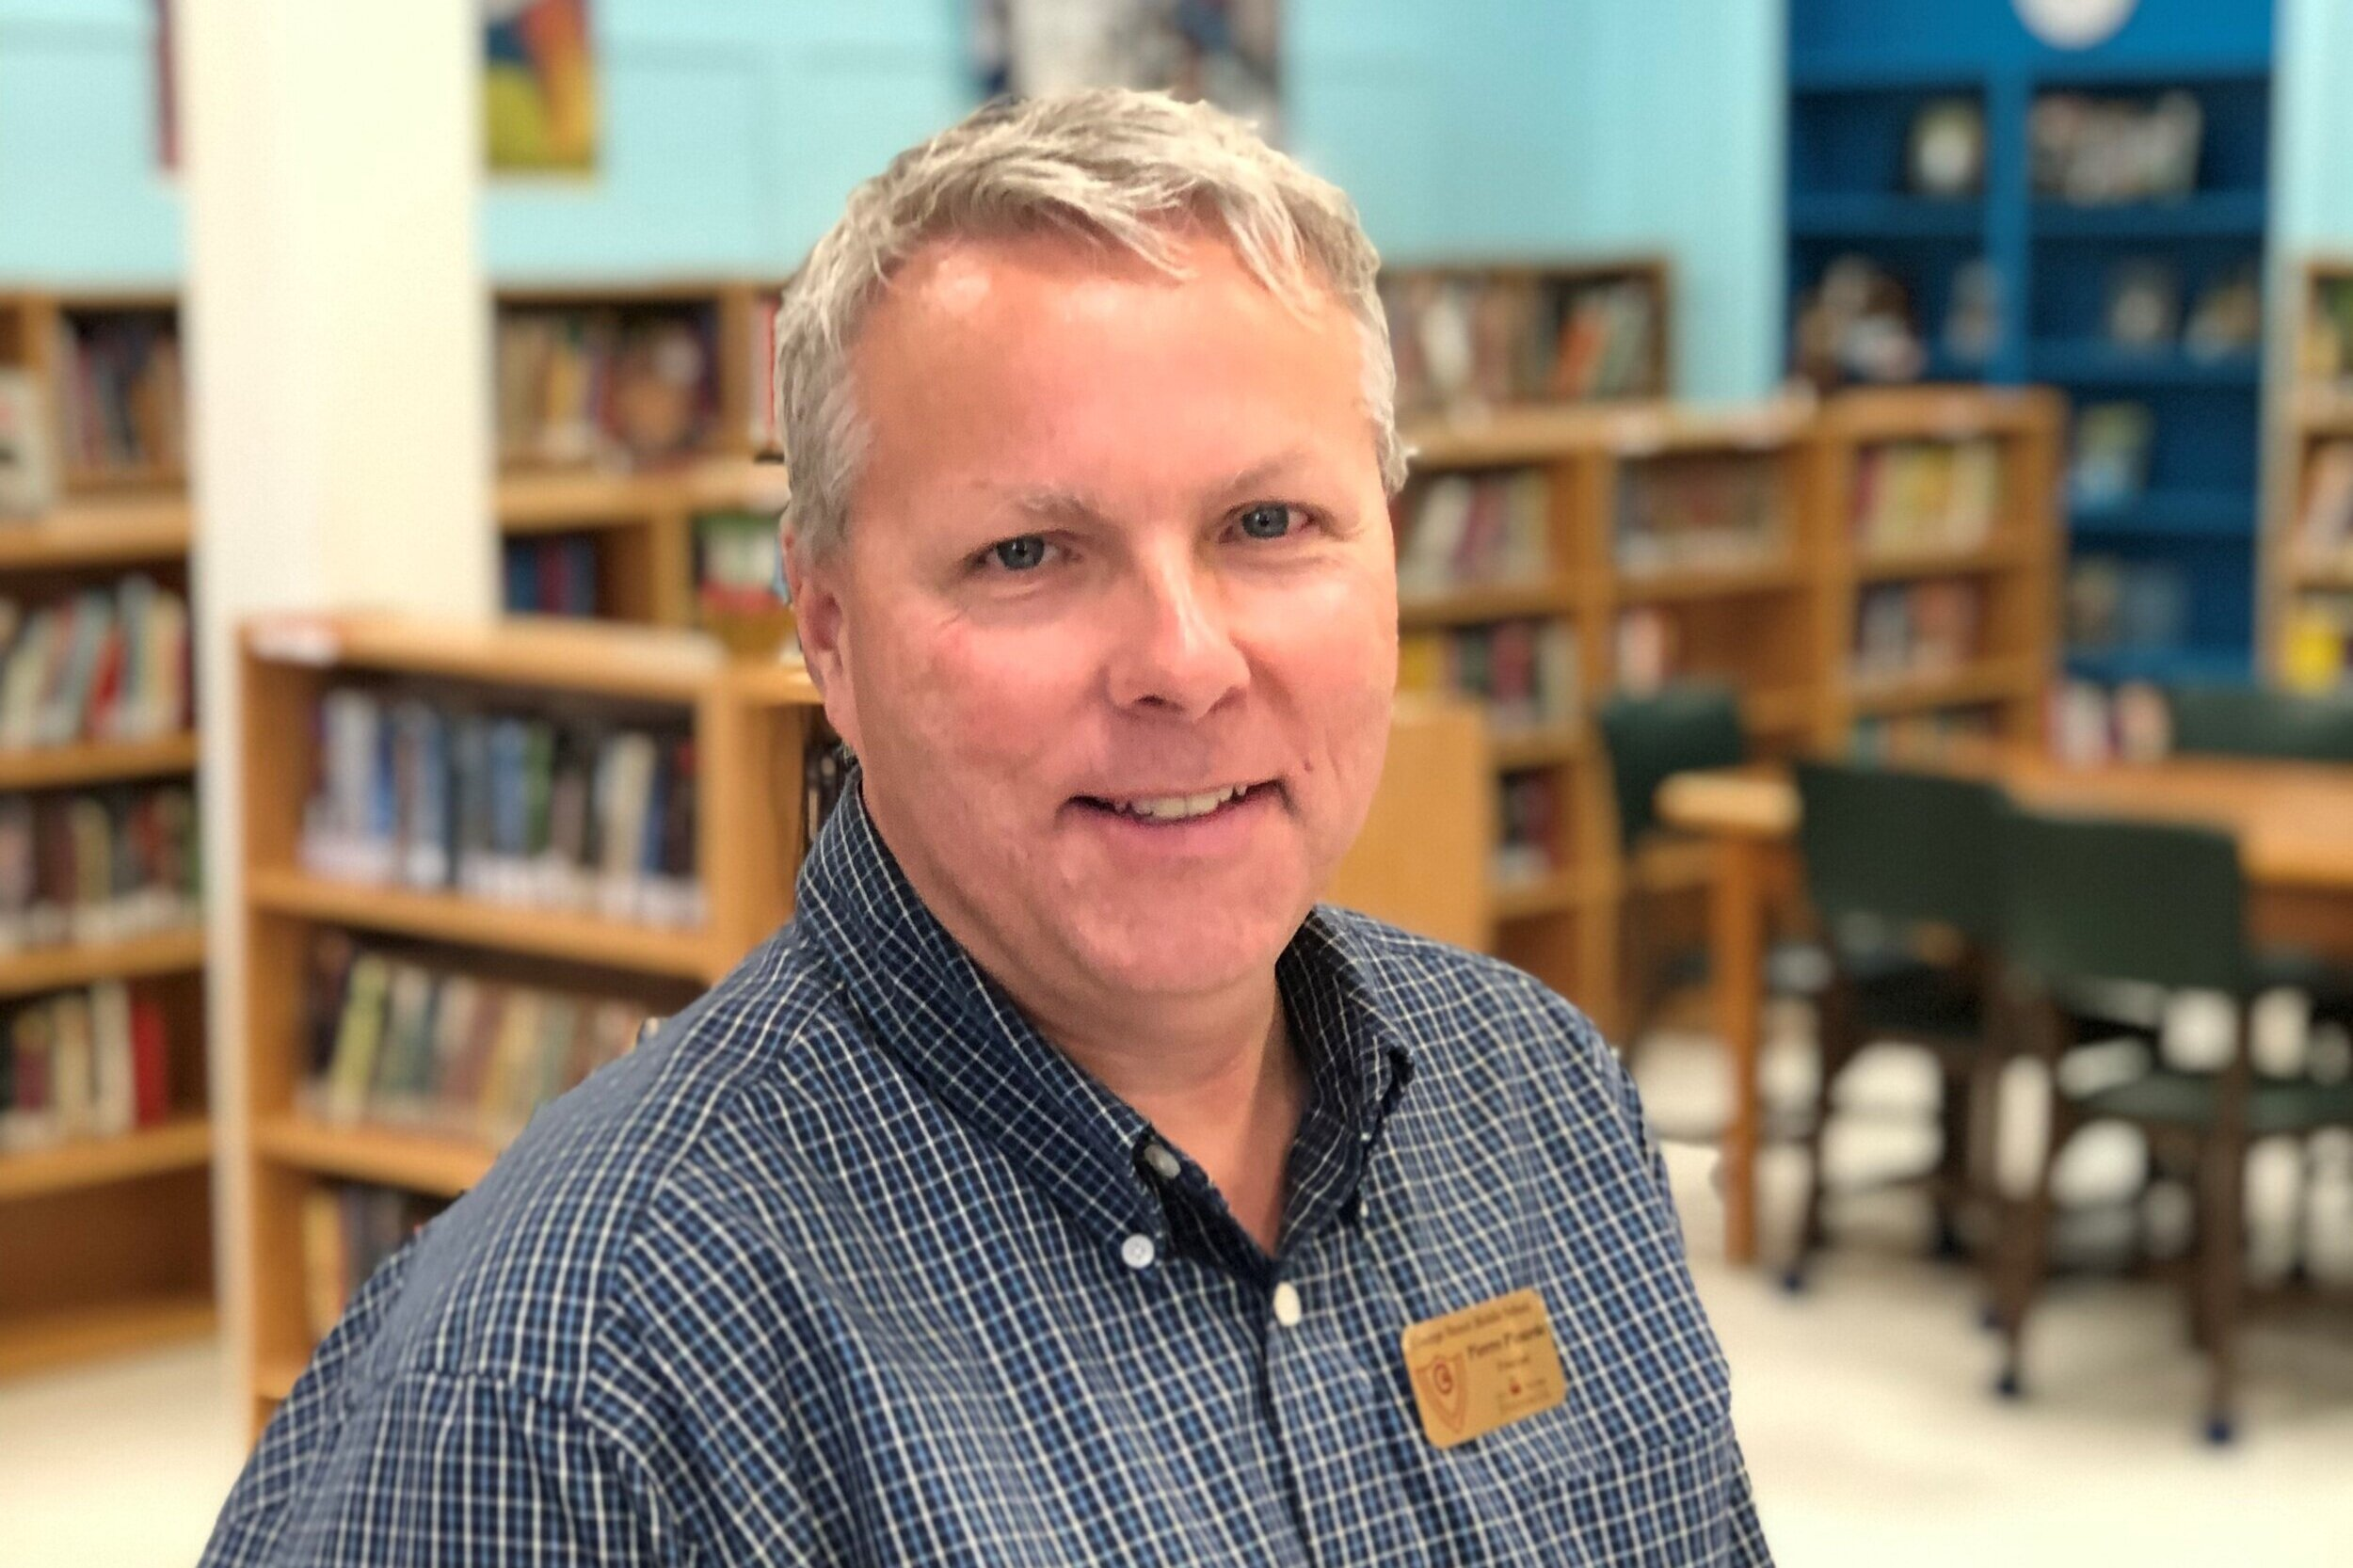 Pierre Plourde - Principal, George St Middle School, Fredericton